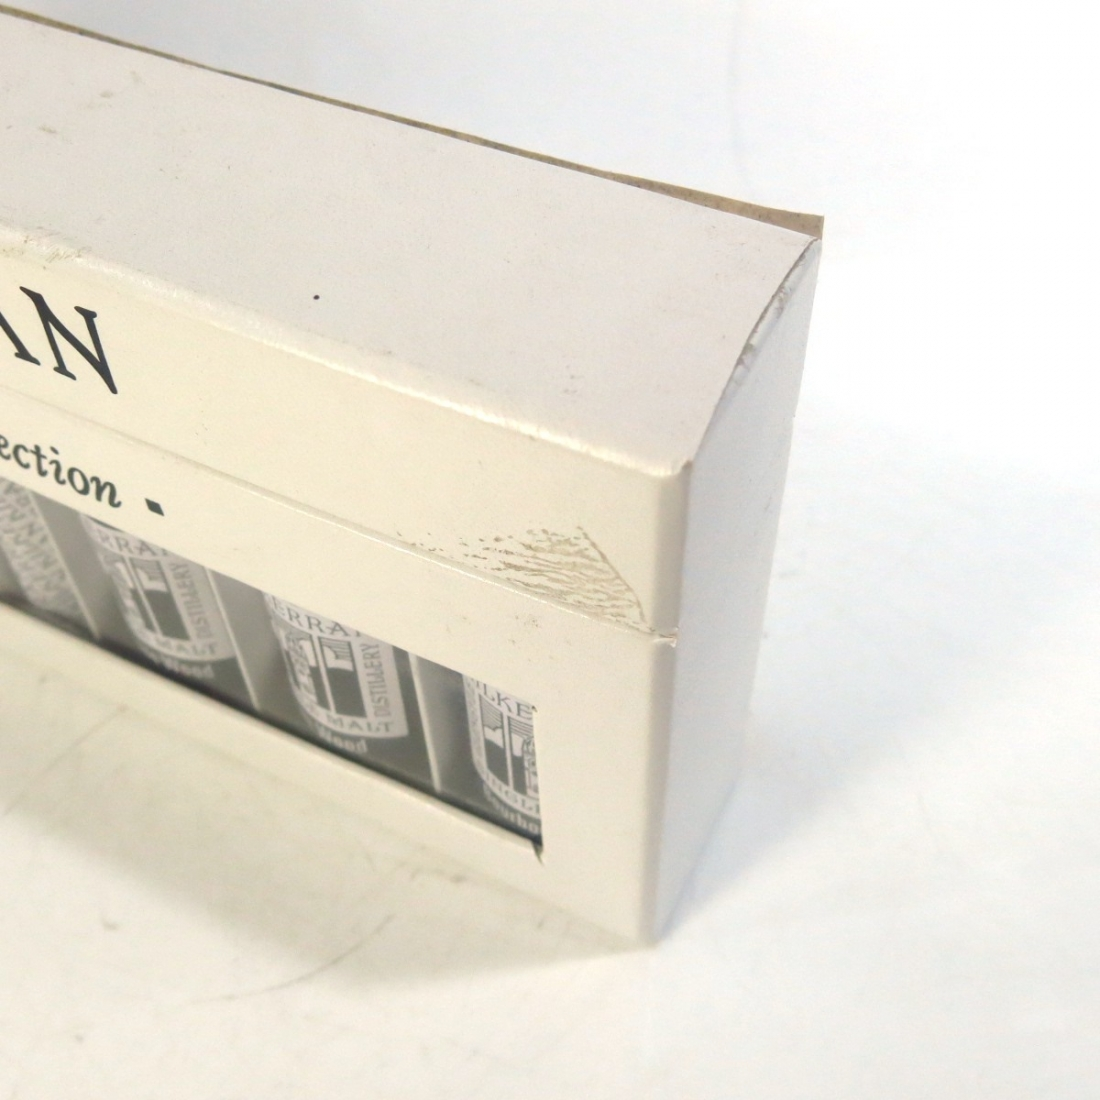 Kilkerran First Cask Selection Miniature Set 6 x 5cl